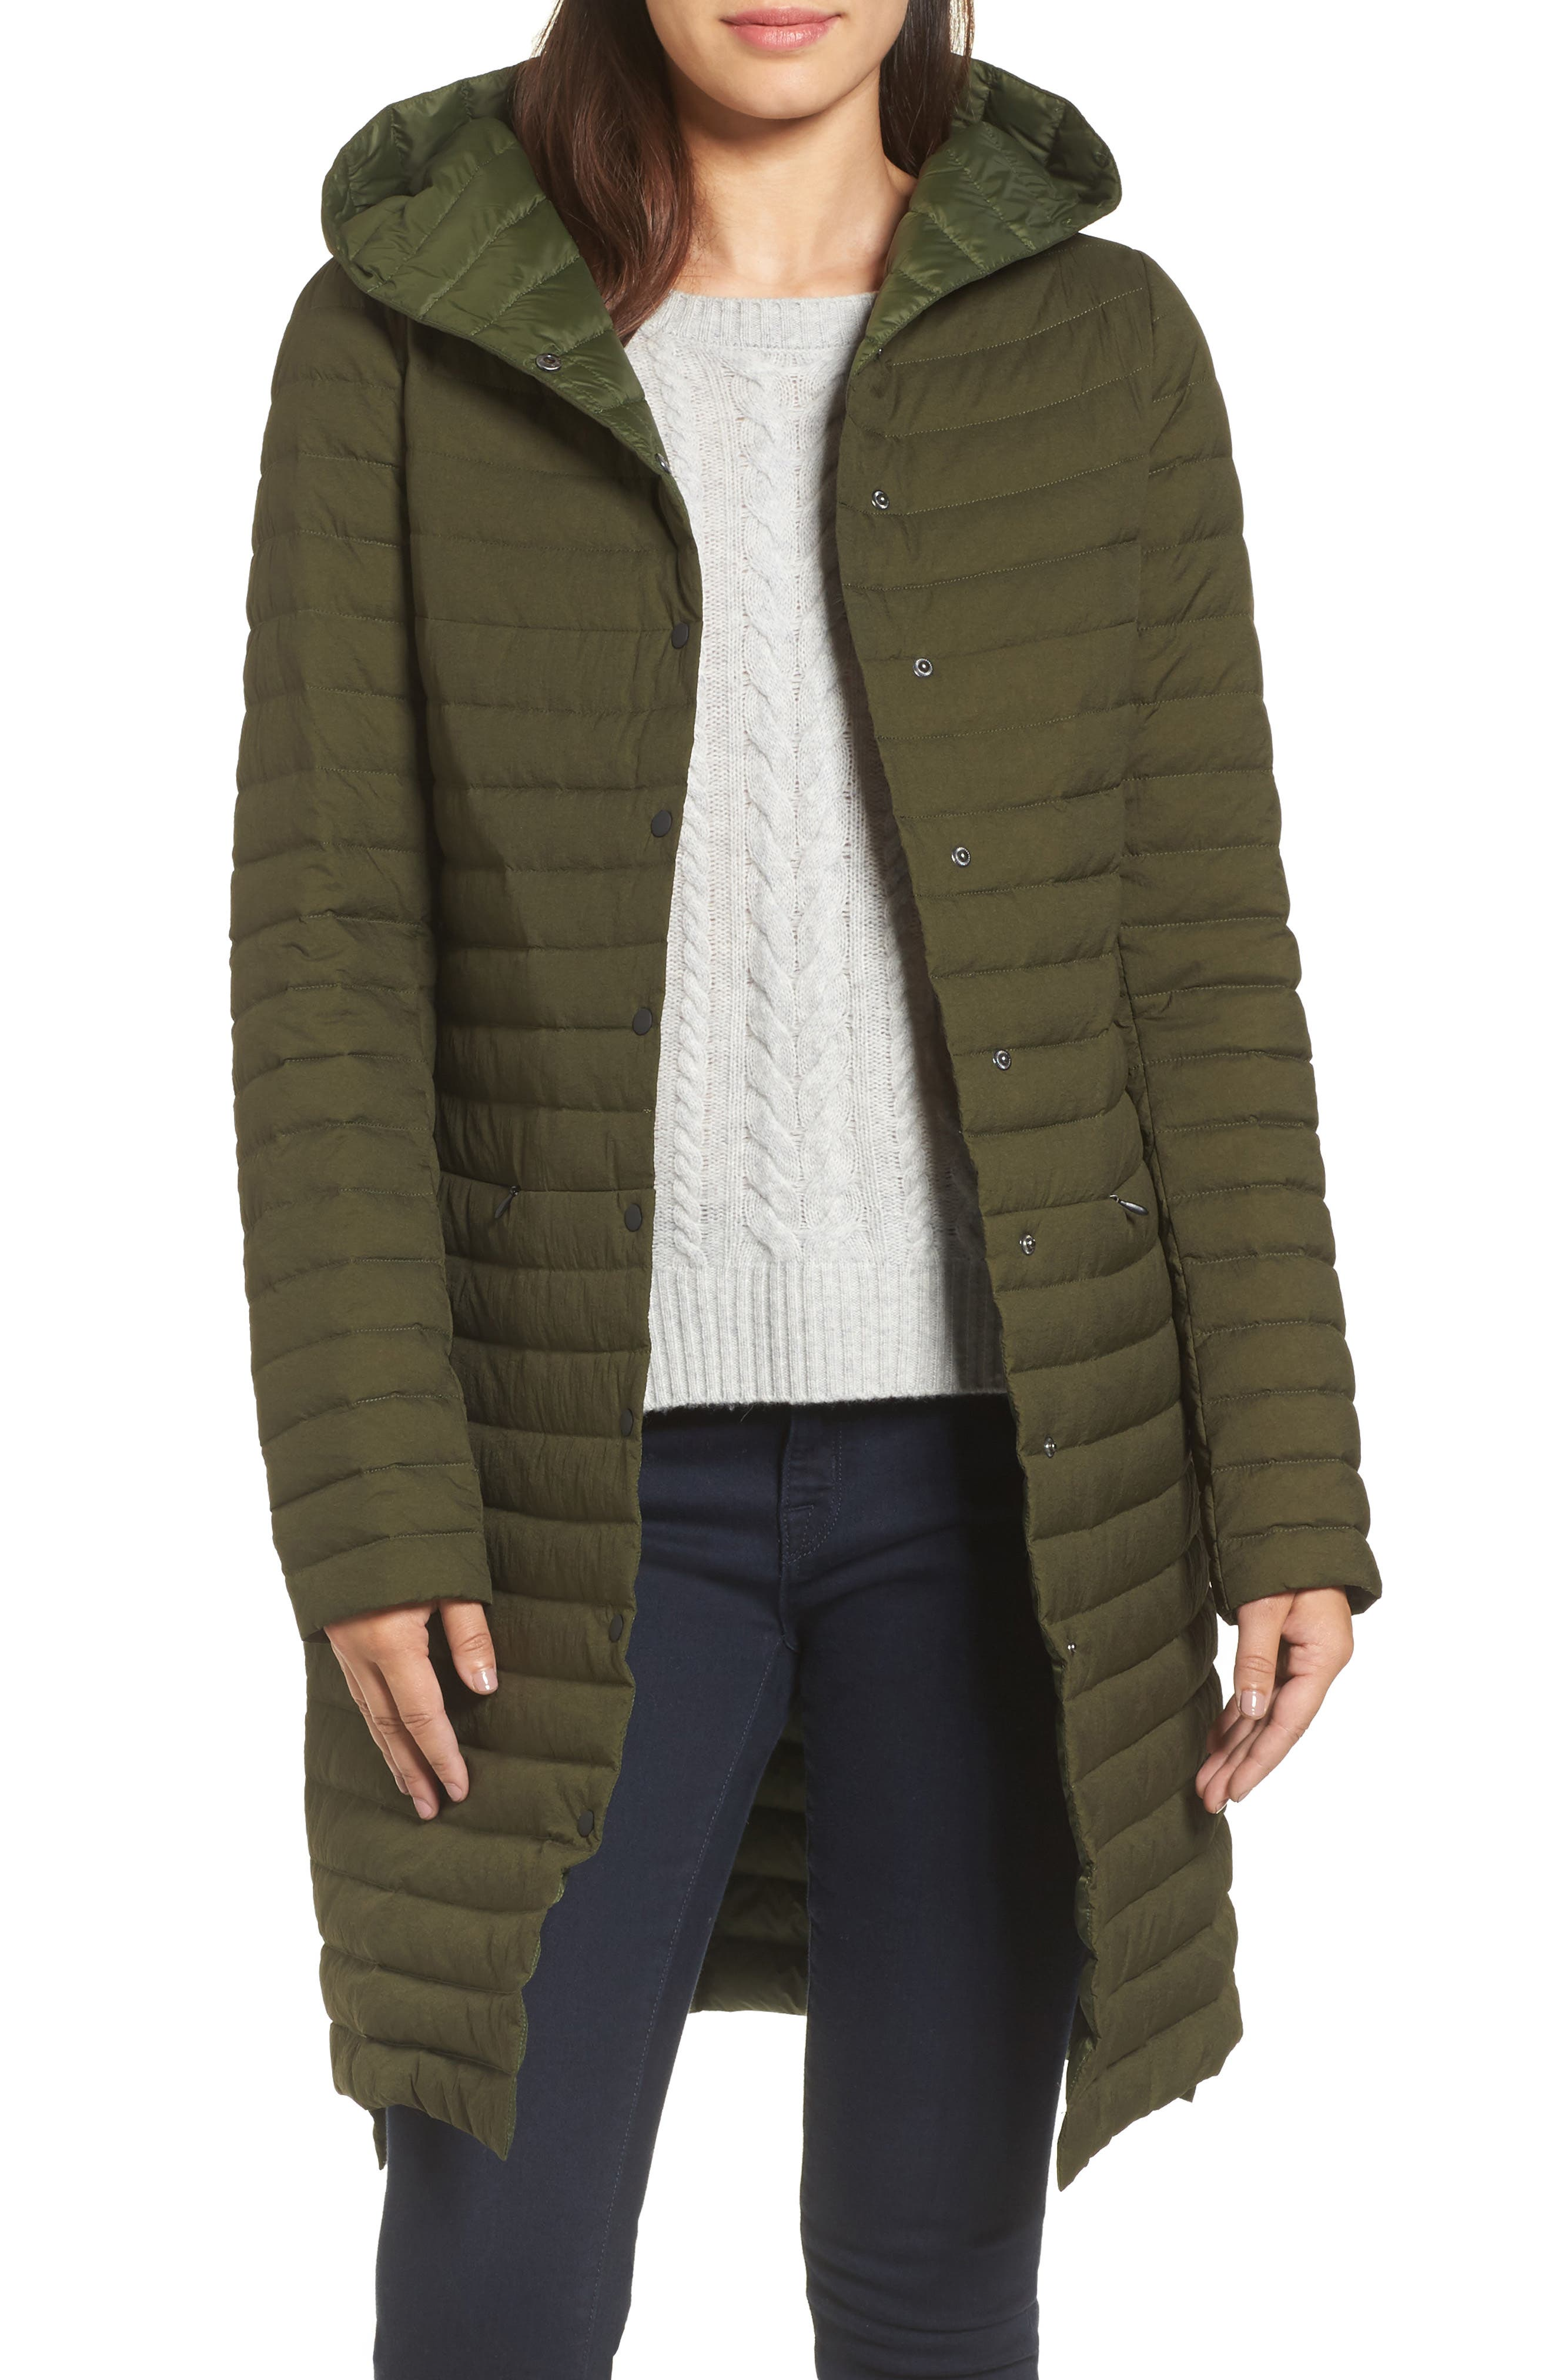 Alternate Image 1 Selected - Trina Turk Edith Hooded Long Coat